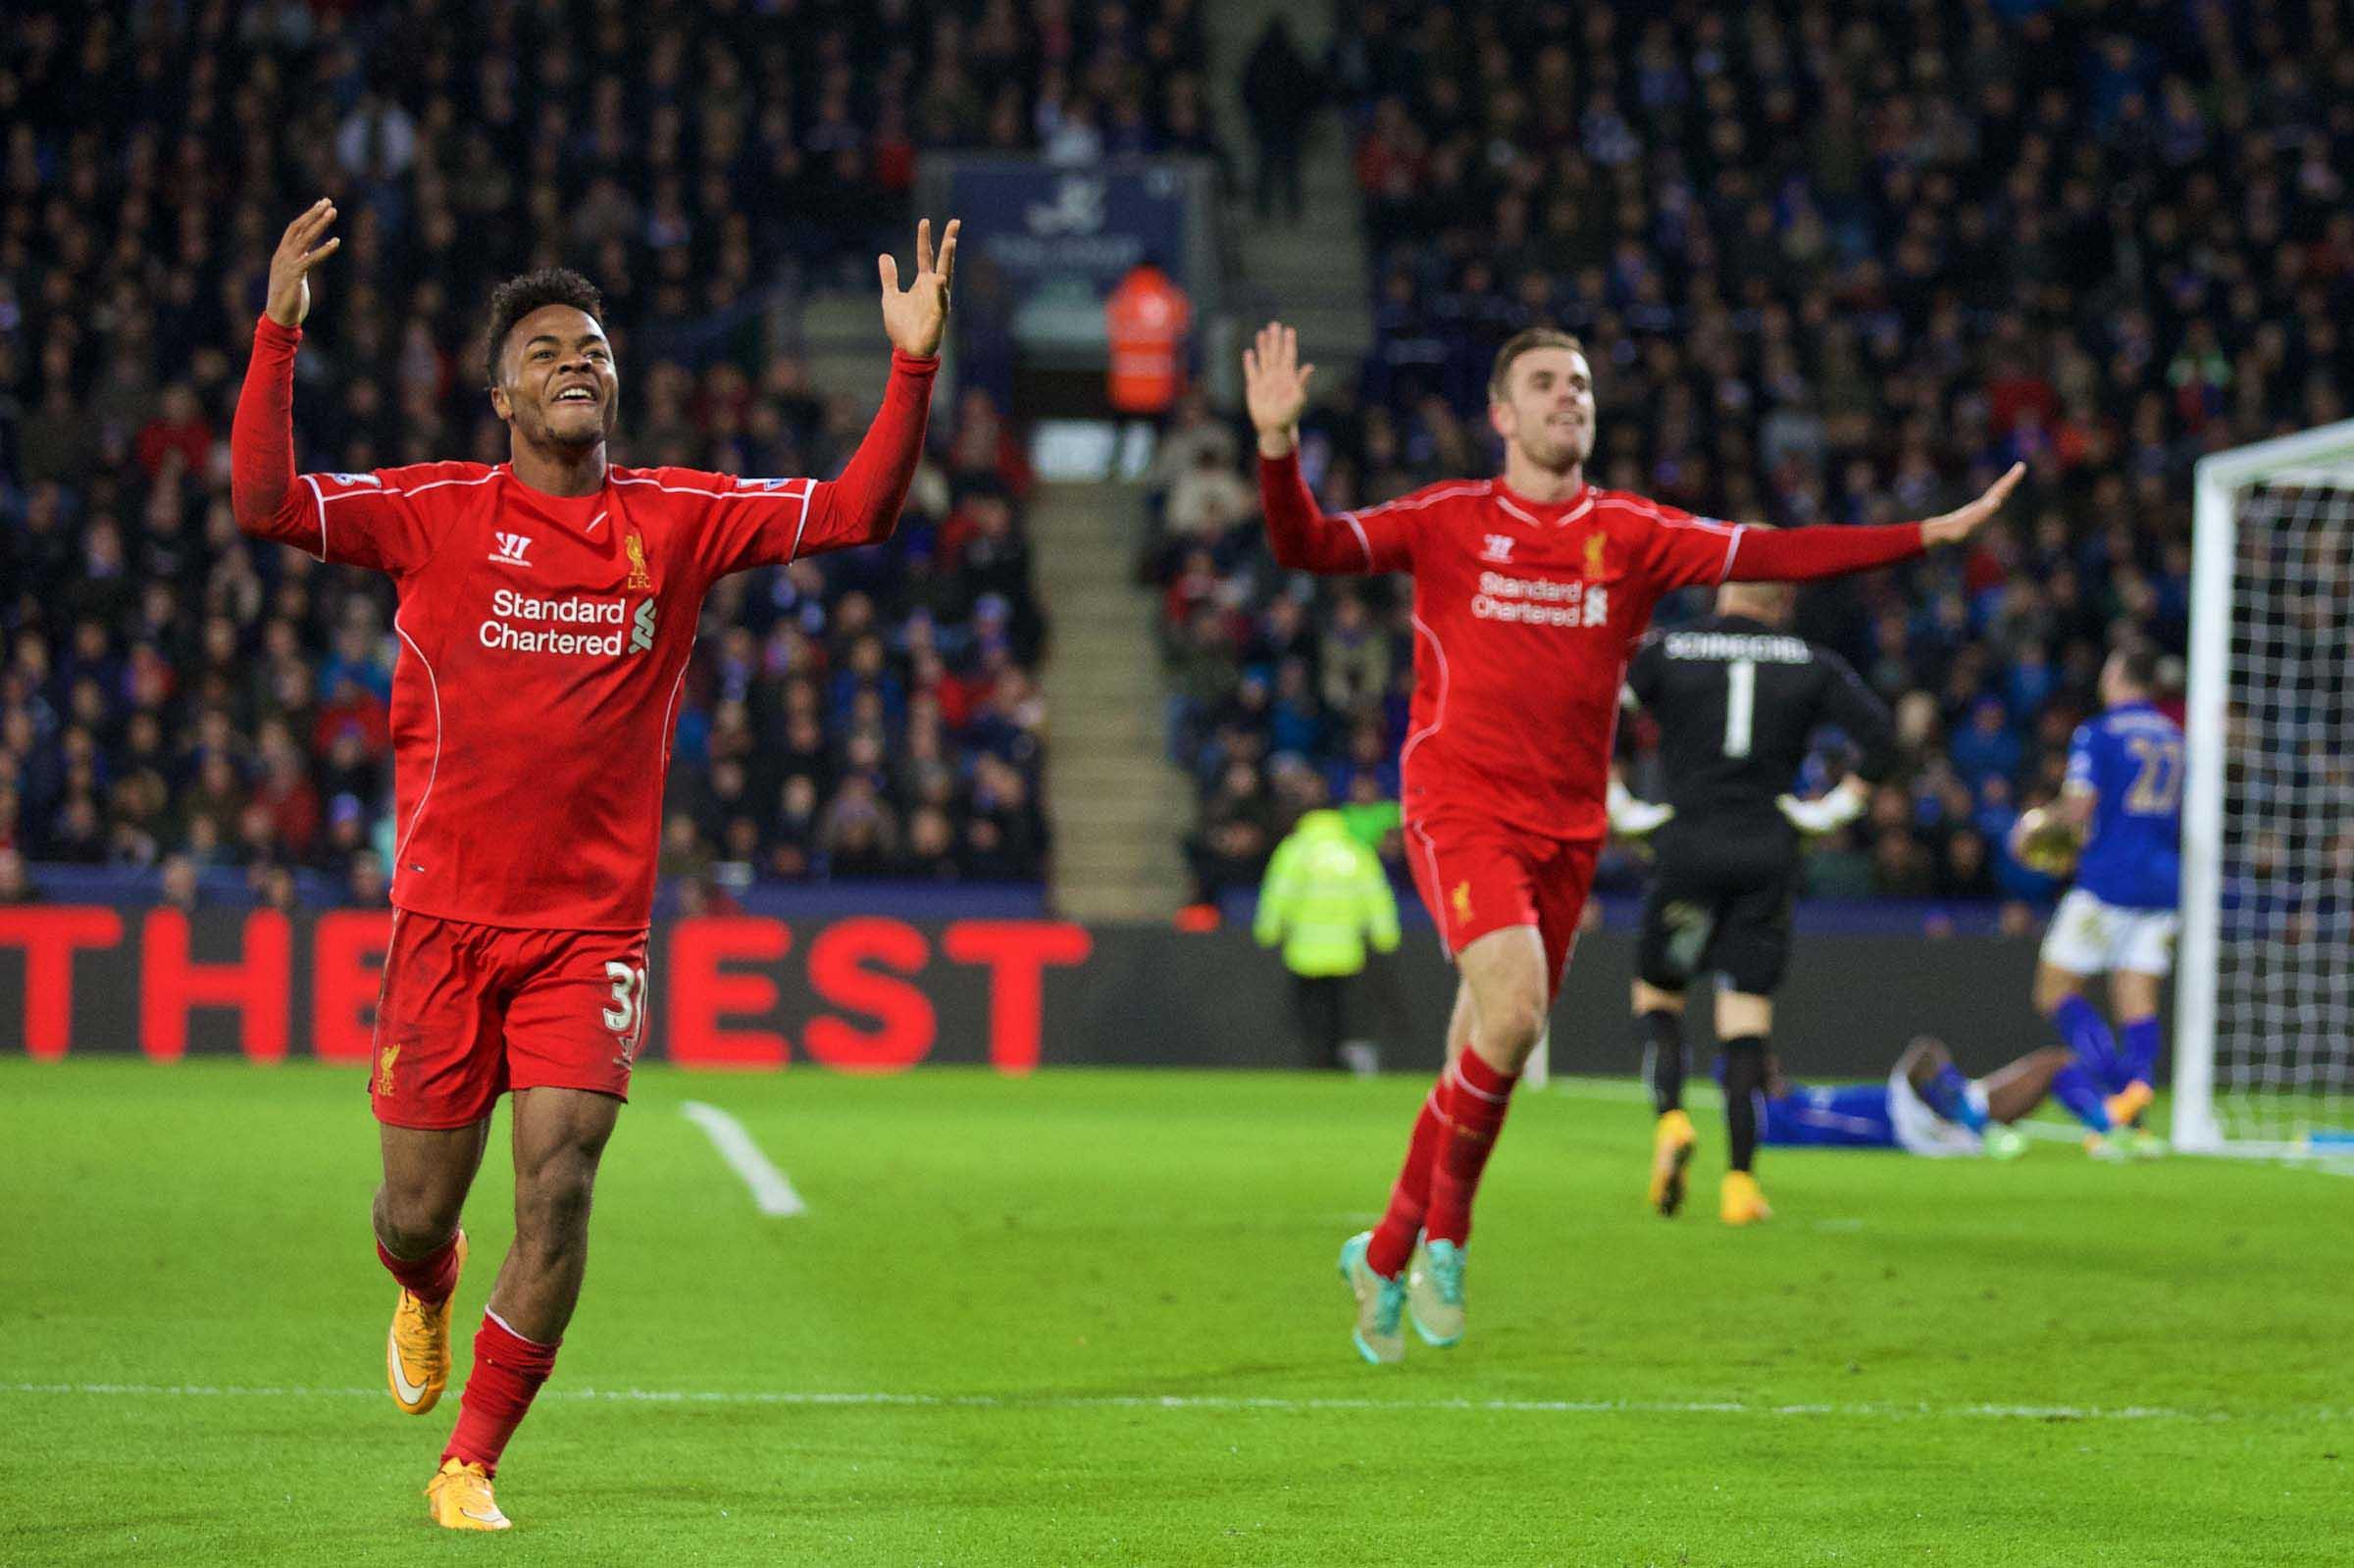 Football - FA Premier League - Leicester City FC v Liverpool FC